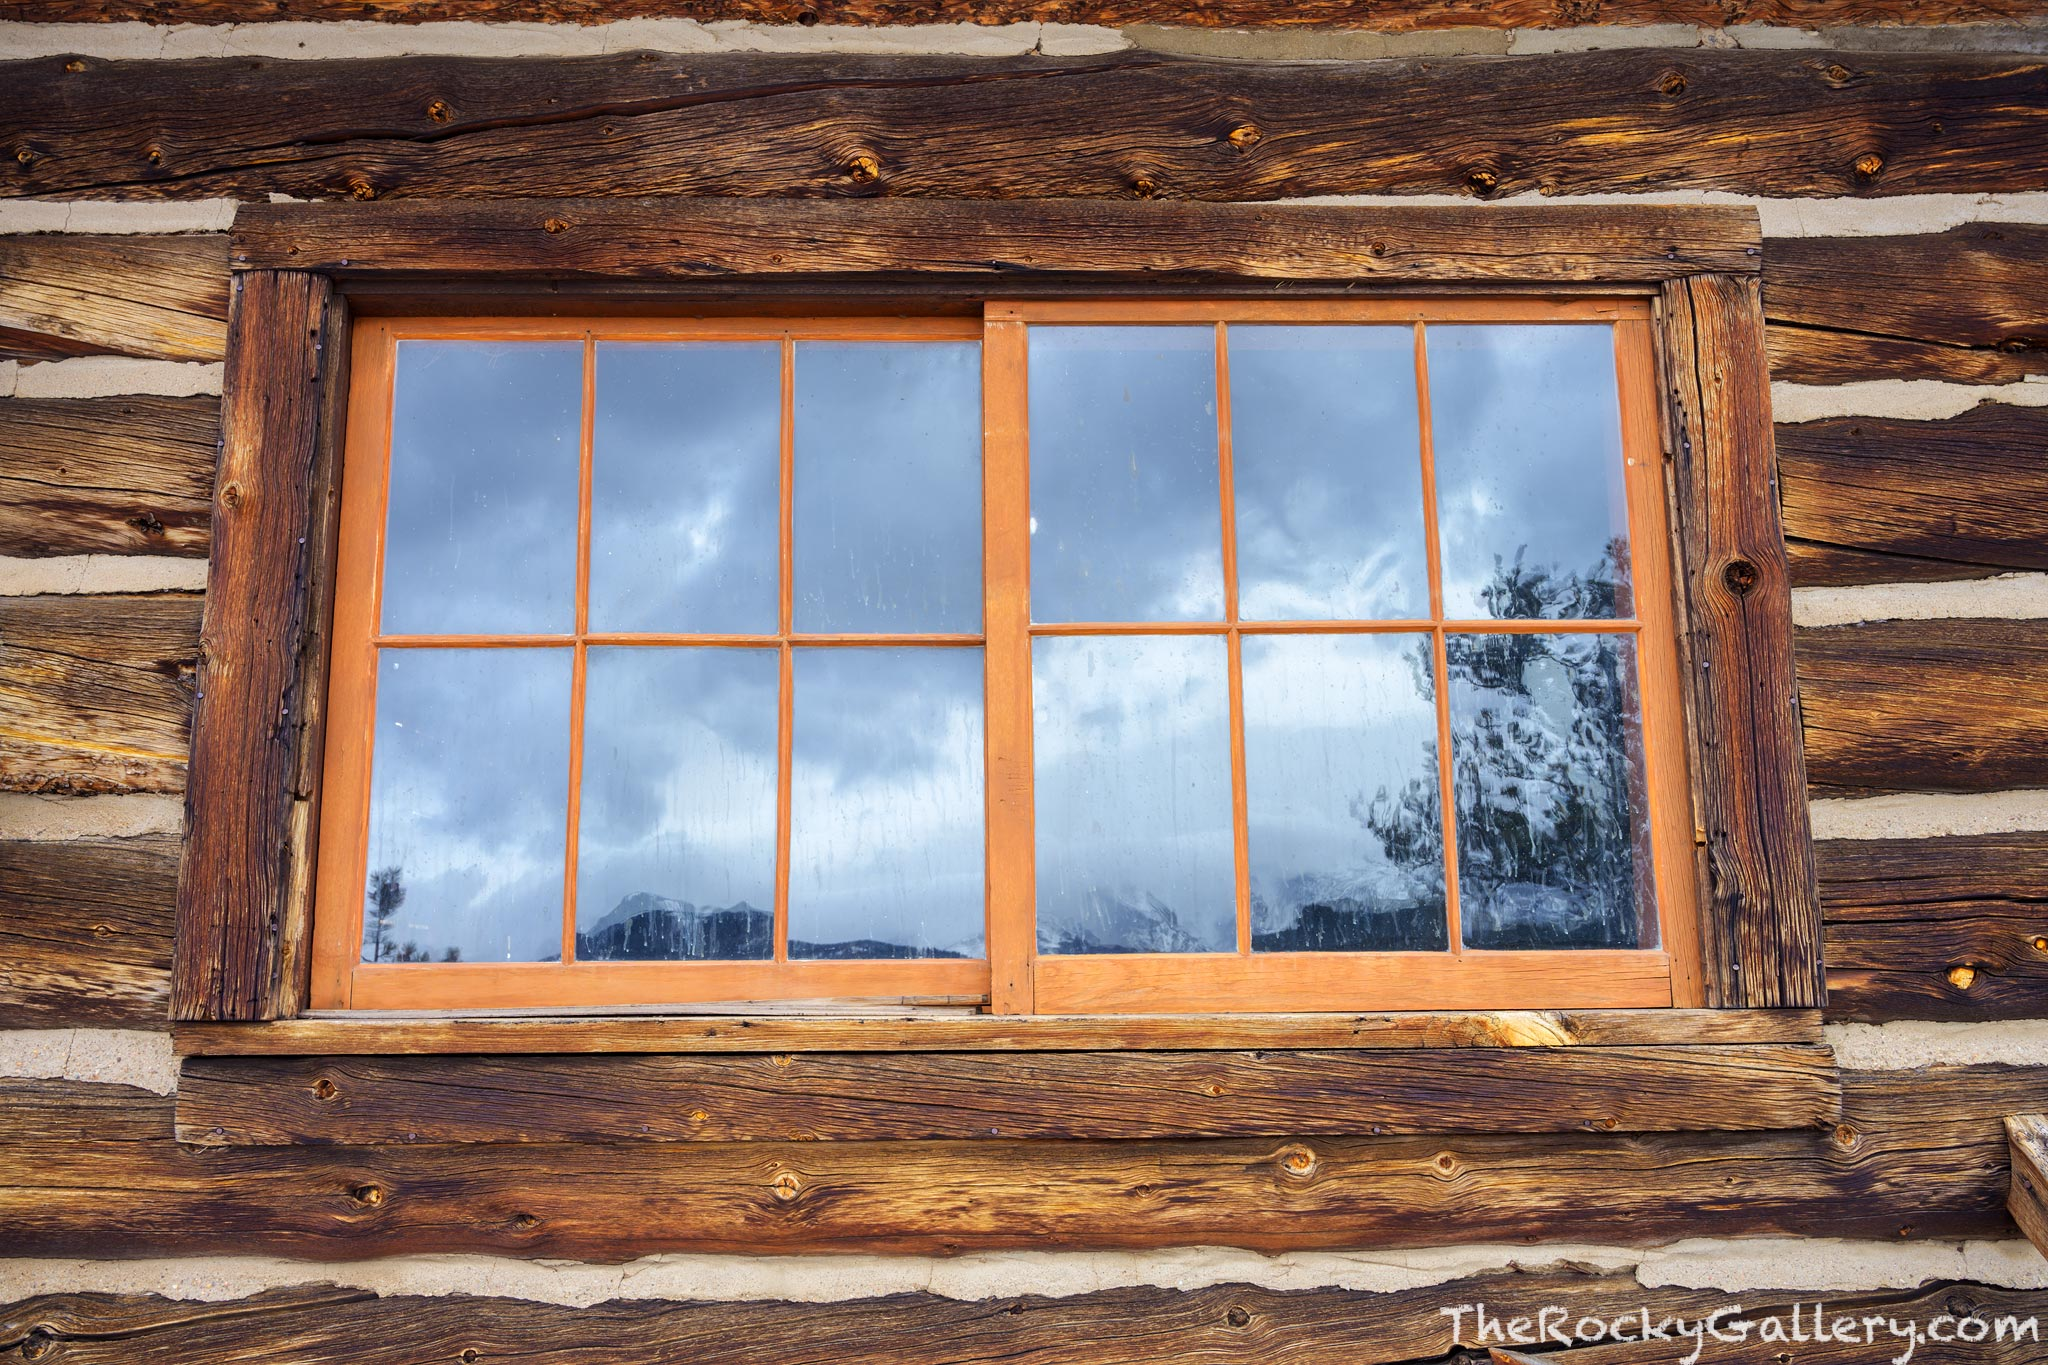 Moraine Park,Colorado,RMNP,Cabin,Landscape,Photography,January,wood,chinking,Continental Divide,Rocky Mountain National Park,Bear Lake Road, photo